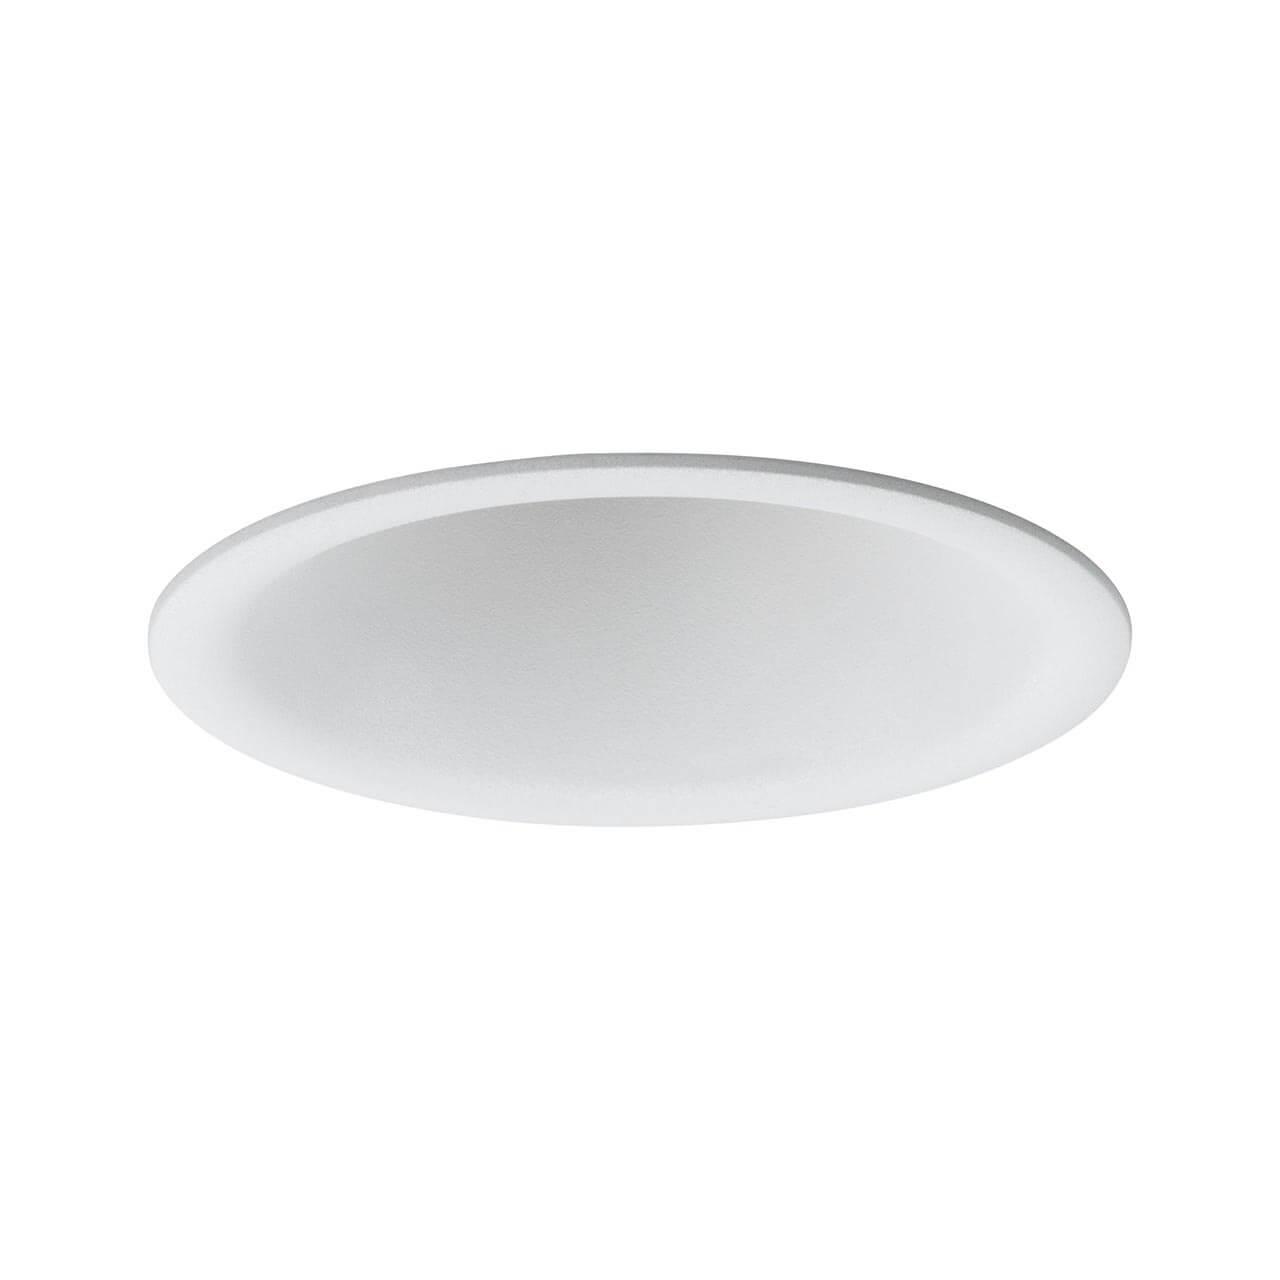 Светильник Paulmann 93417 Cymbal